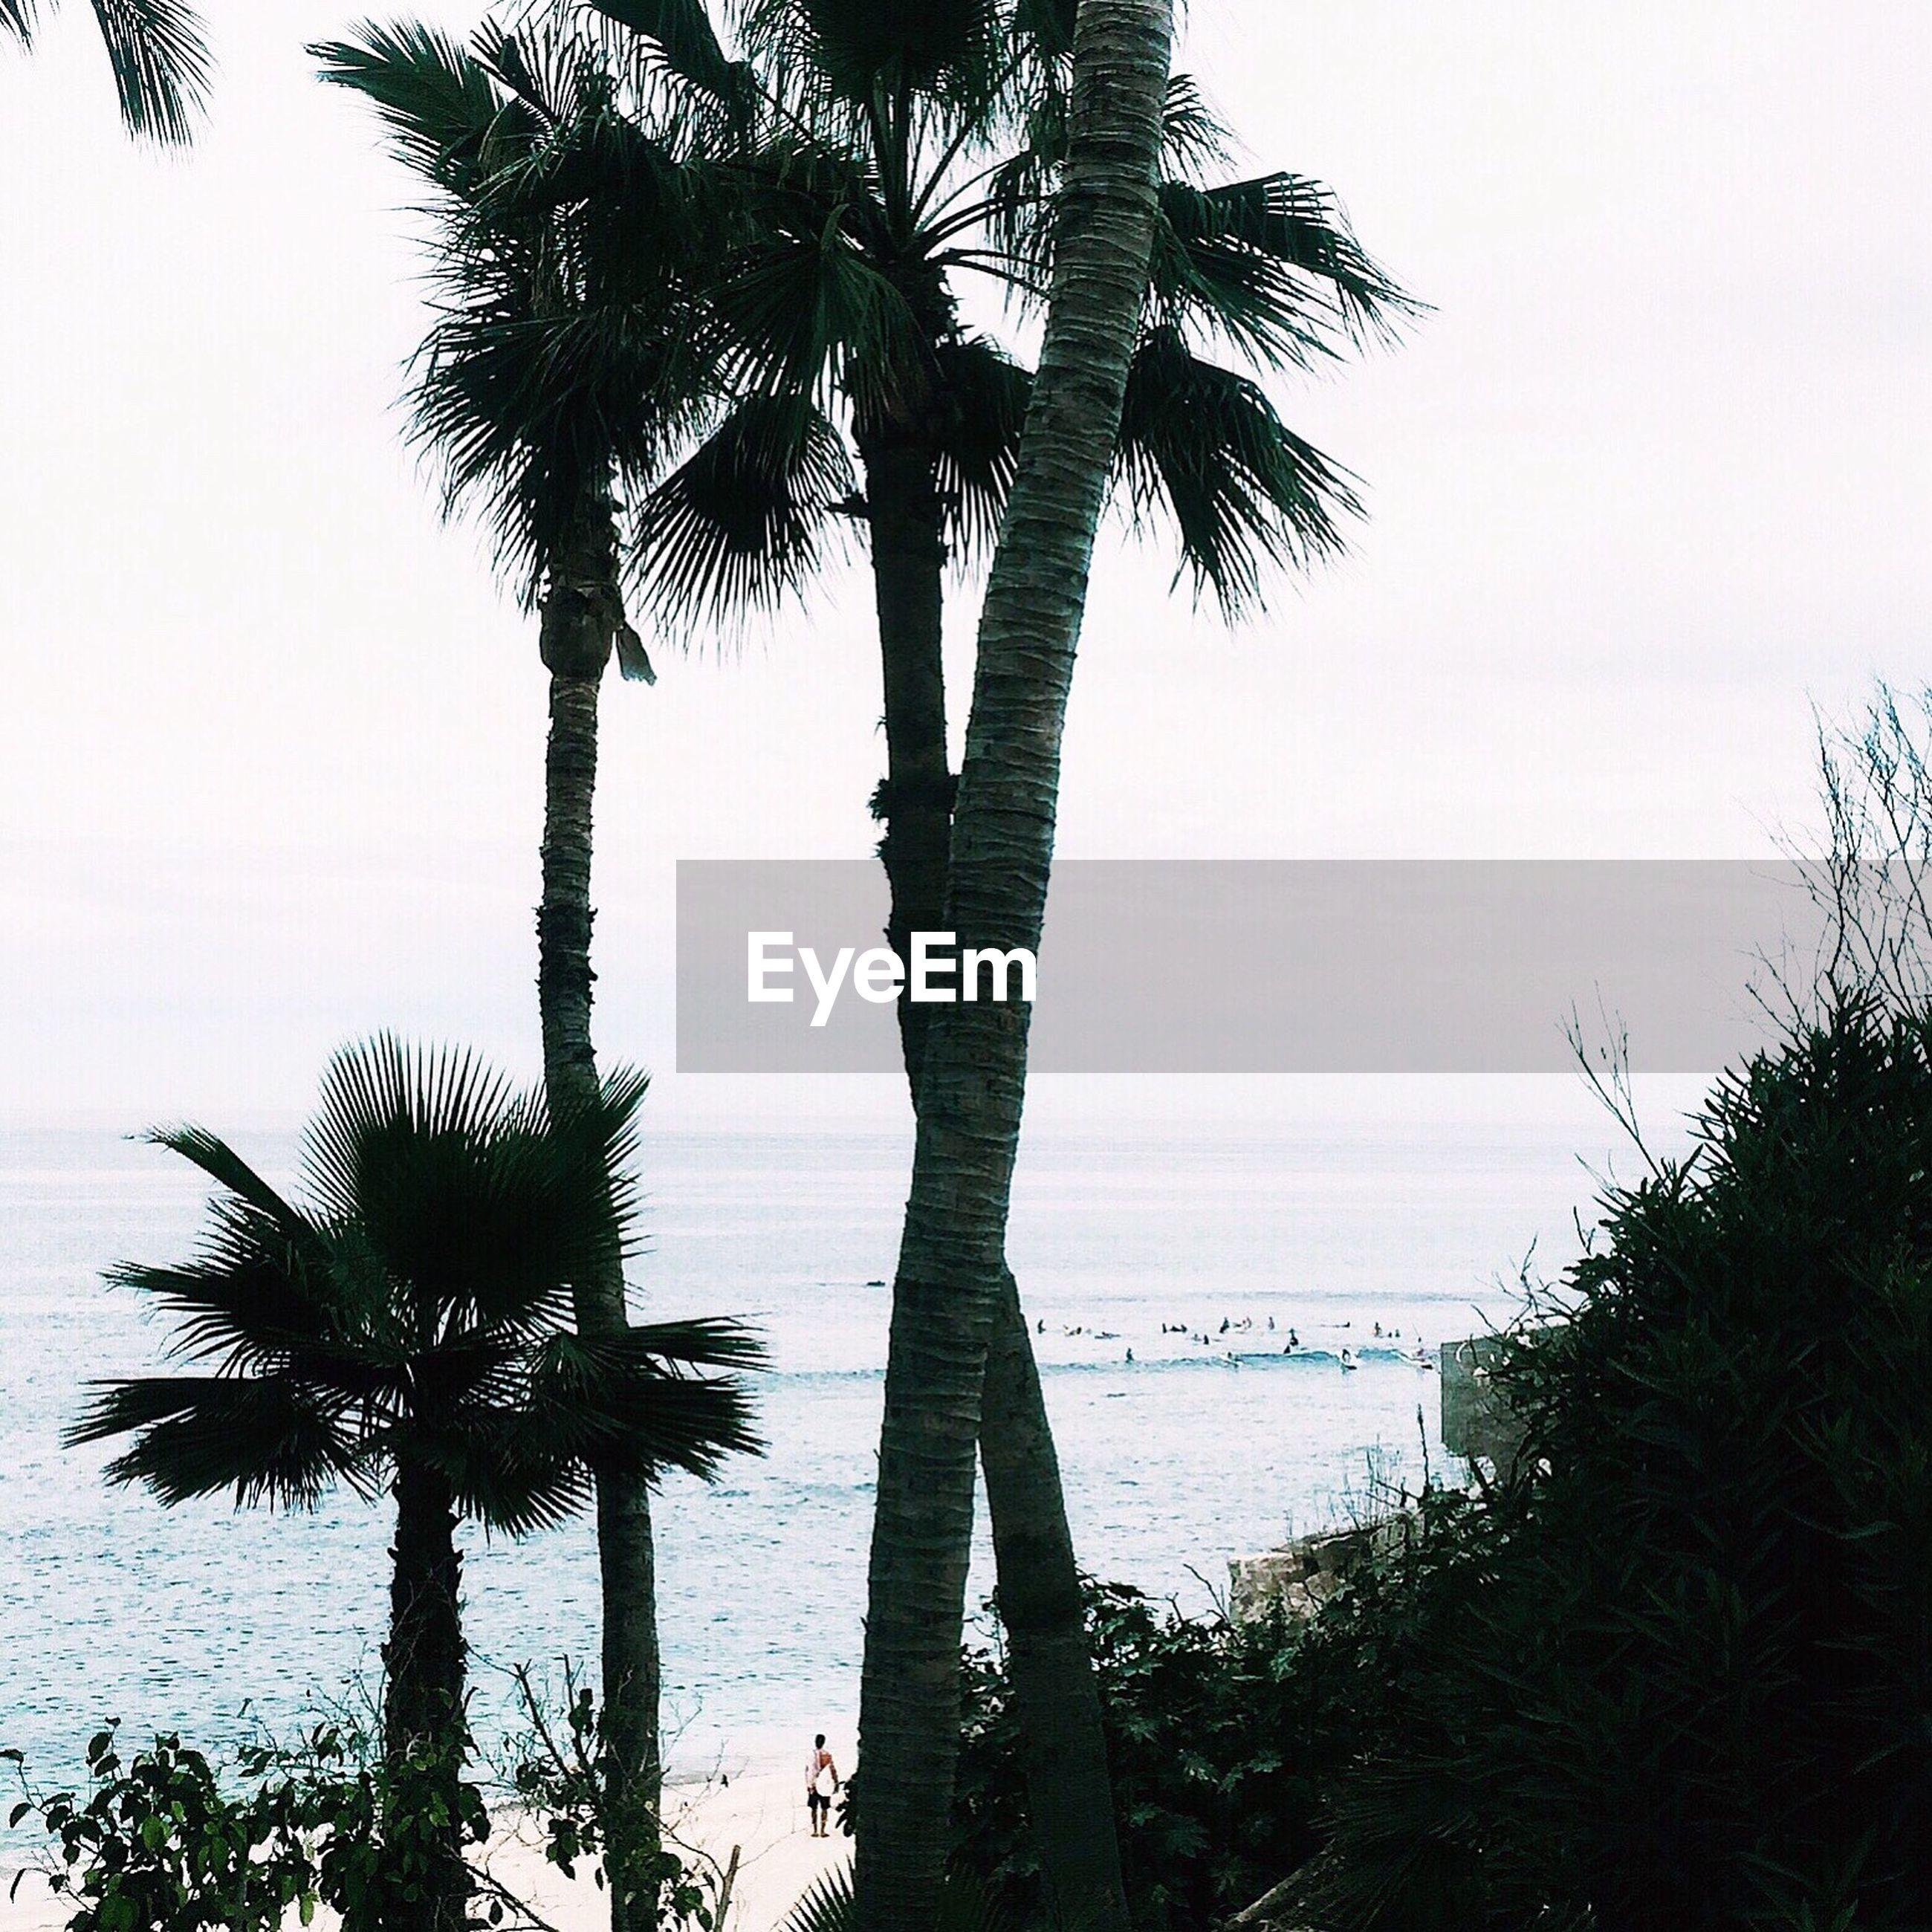 SILHOUETTE PALM TREES ON BEACH AGAINST CLEAR SKY